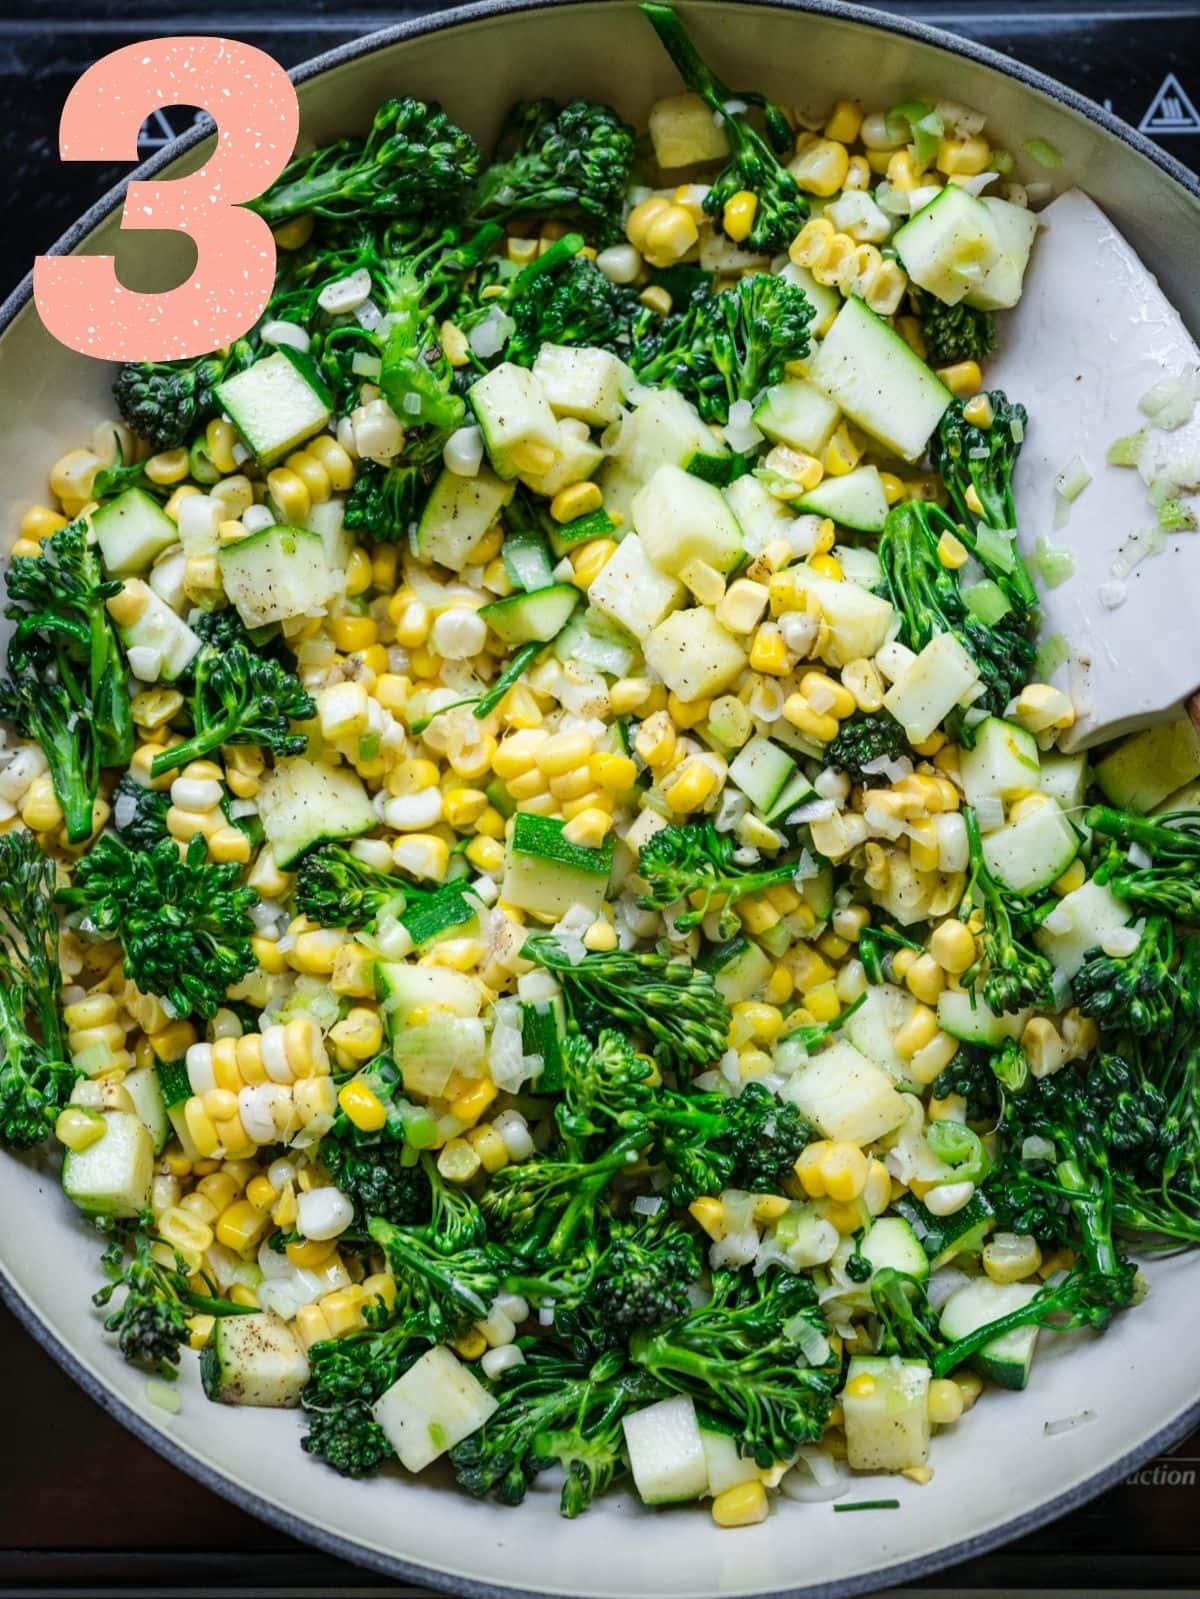 Step 3: cooking corn, zucchini, broccolini.